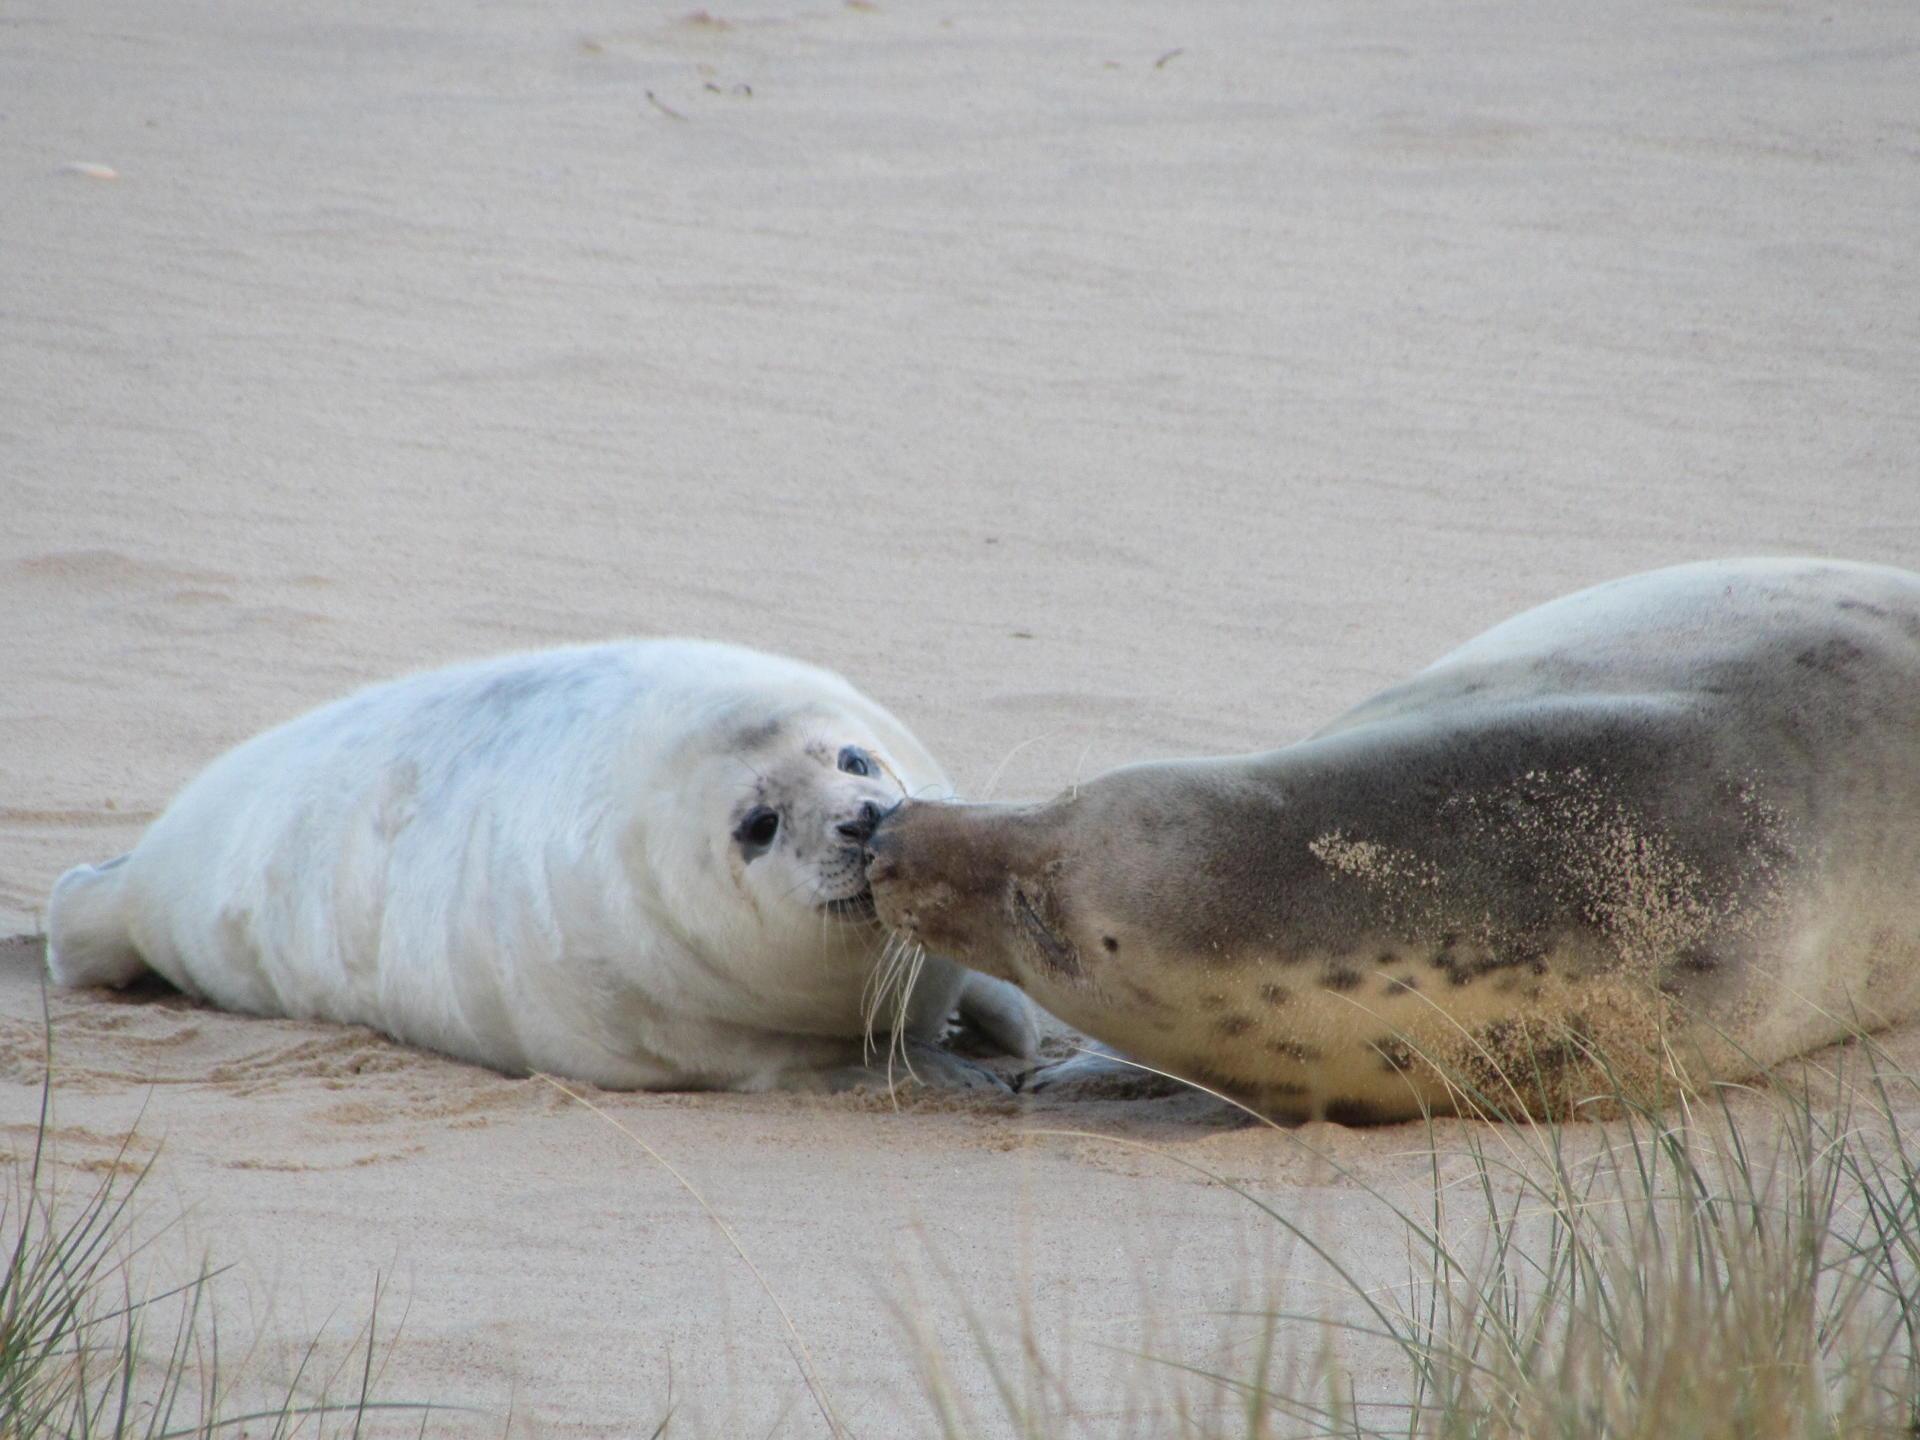 Seal Watching in North Norfolk - Yesihaveablog | Seals of Horsey Gap | Norfolk - Life in a Fine City | Winterlust